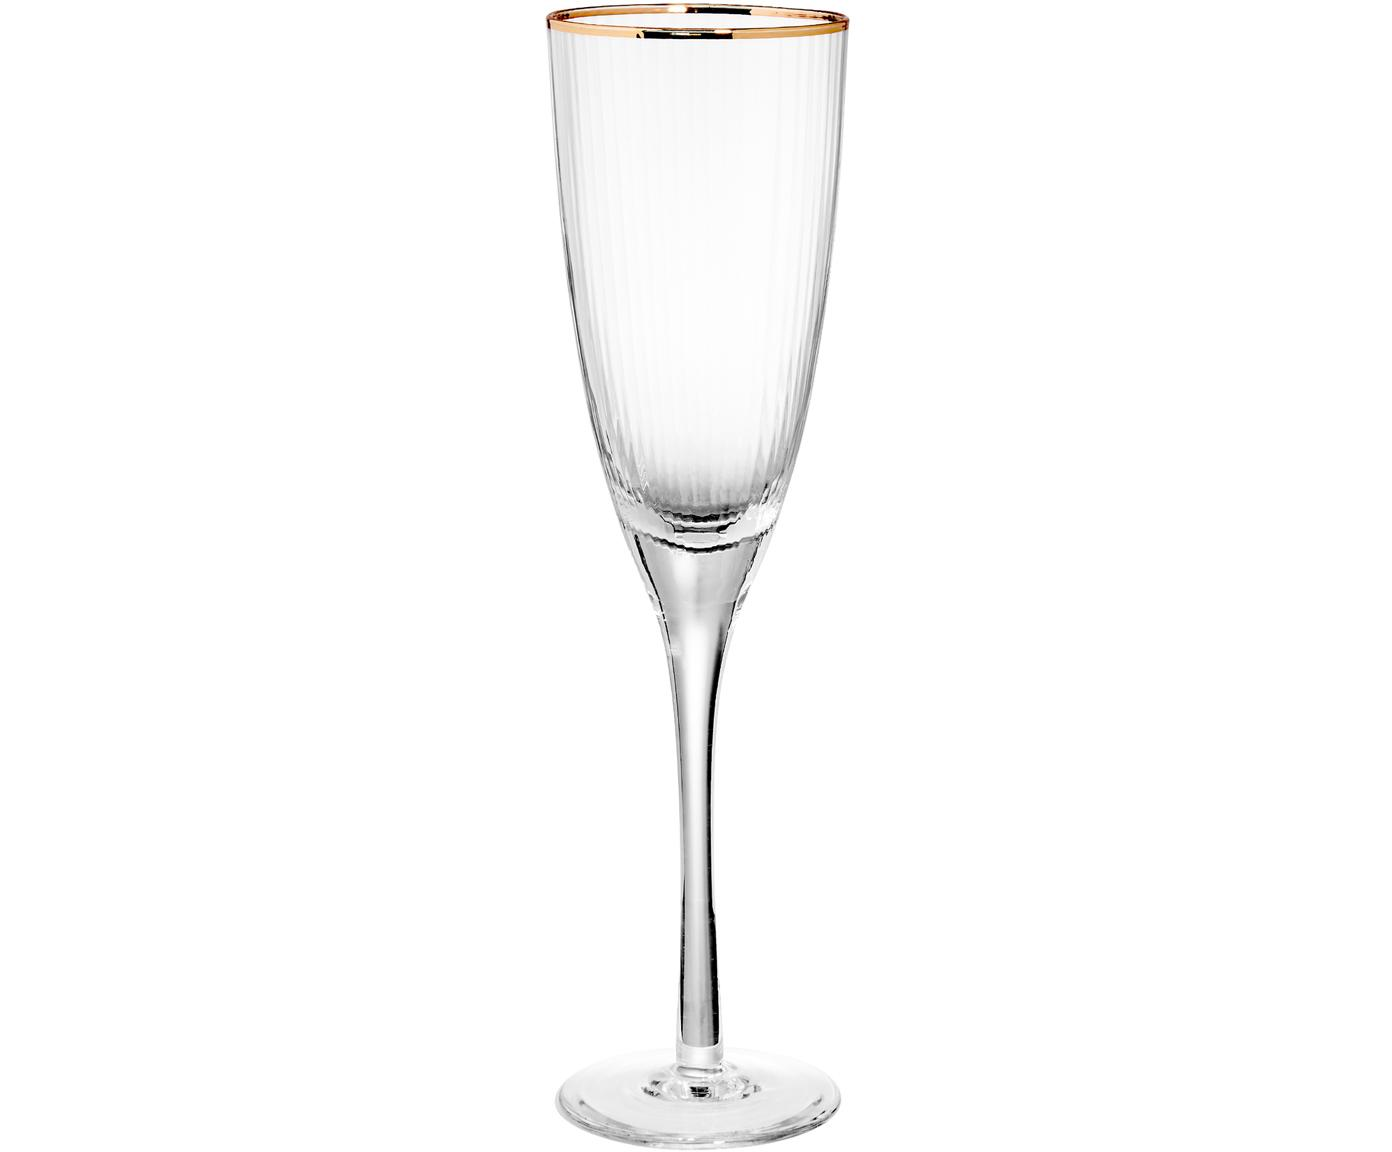 Champagnergläser Golden Twenties mit Goldrand, 4er-Set, Glas, Transparent, Ø 7 x H 26 cm